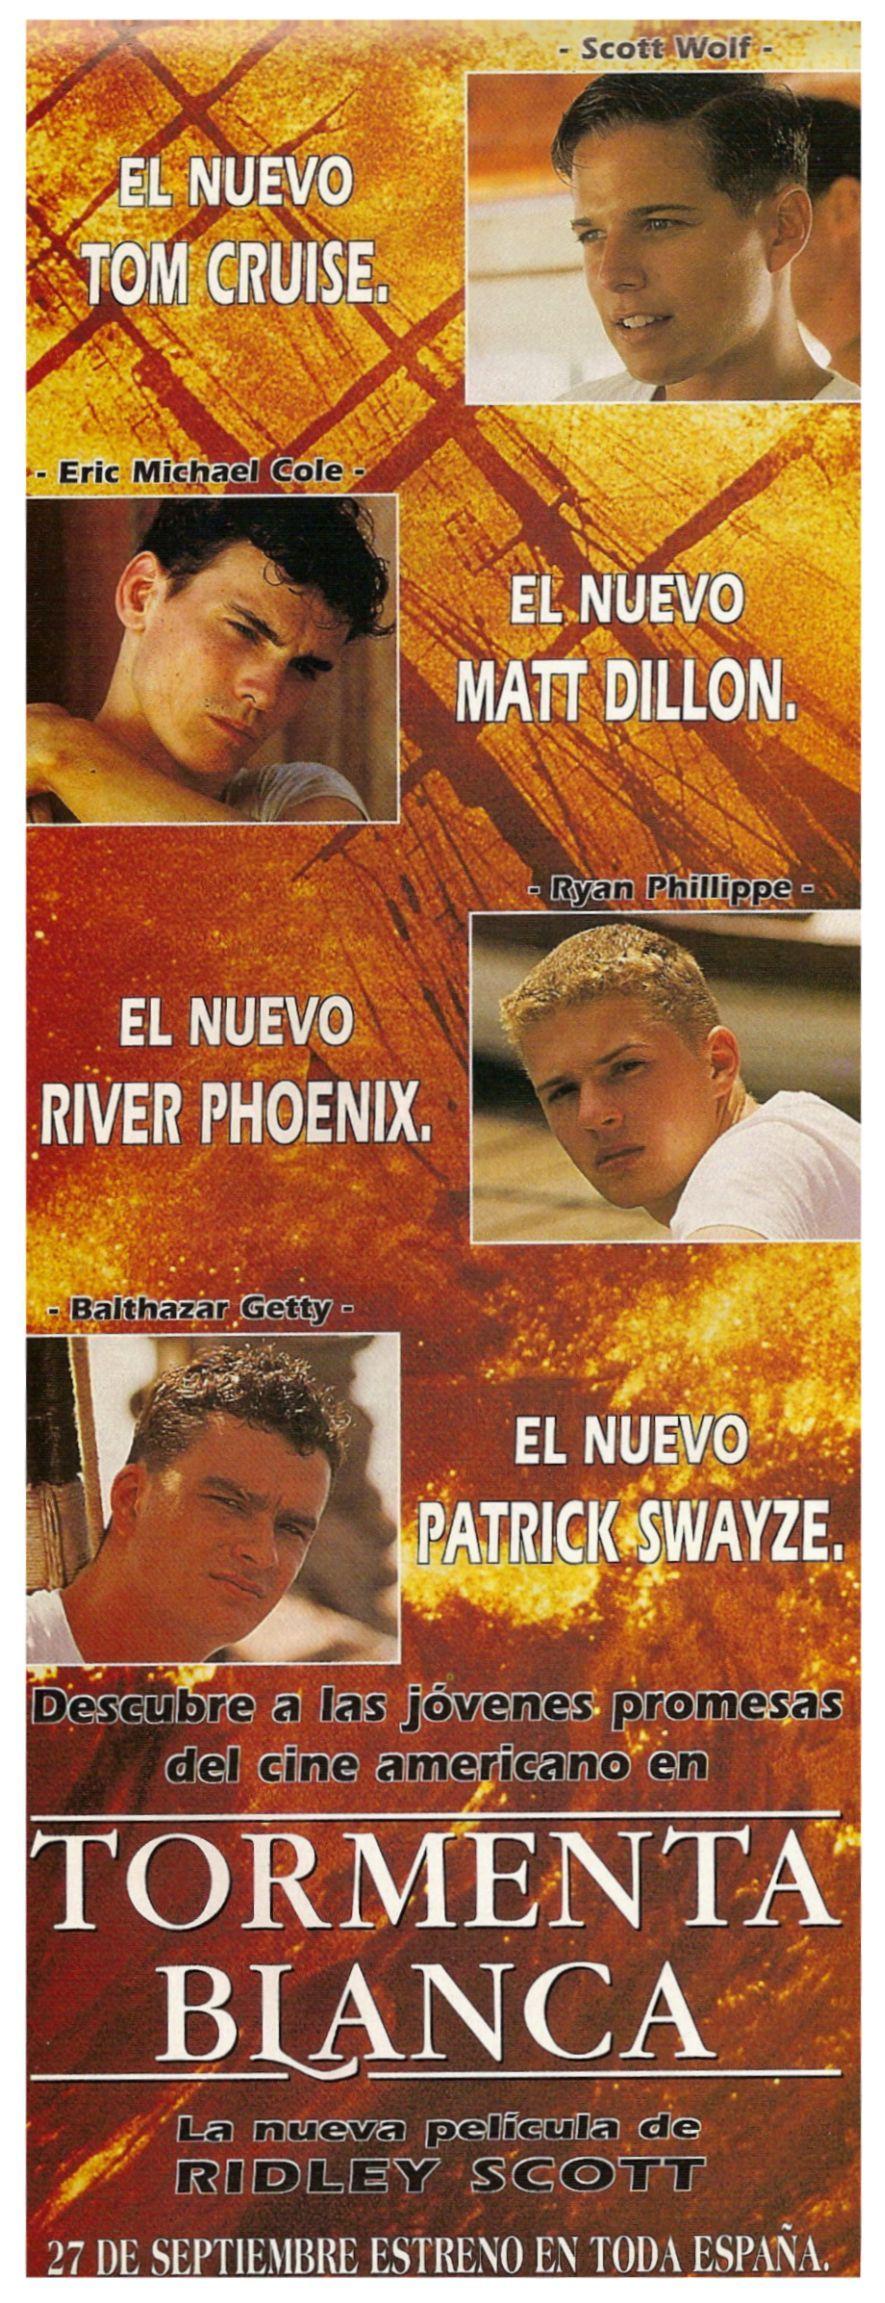 Tormenta Blanca 1996 White Squall De Ridley Scott Tt0118158 Tom Cruise Matt Dillon River Phoenix